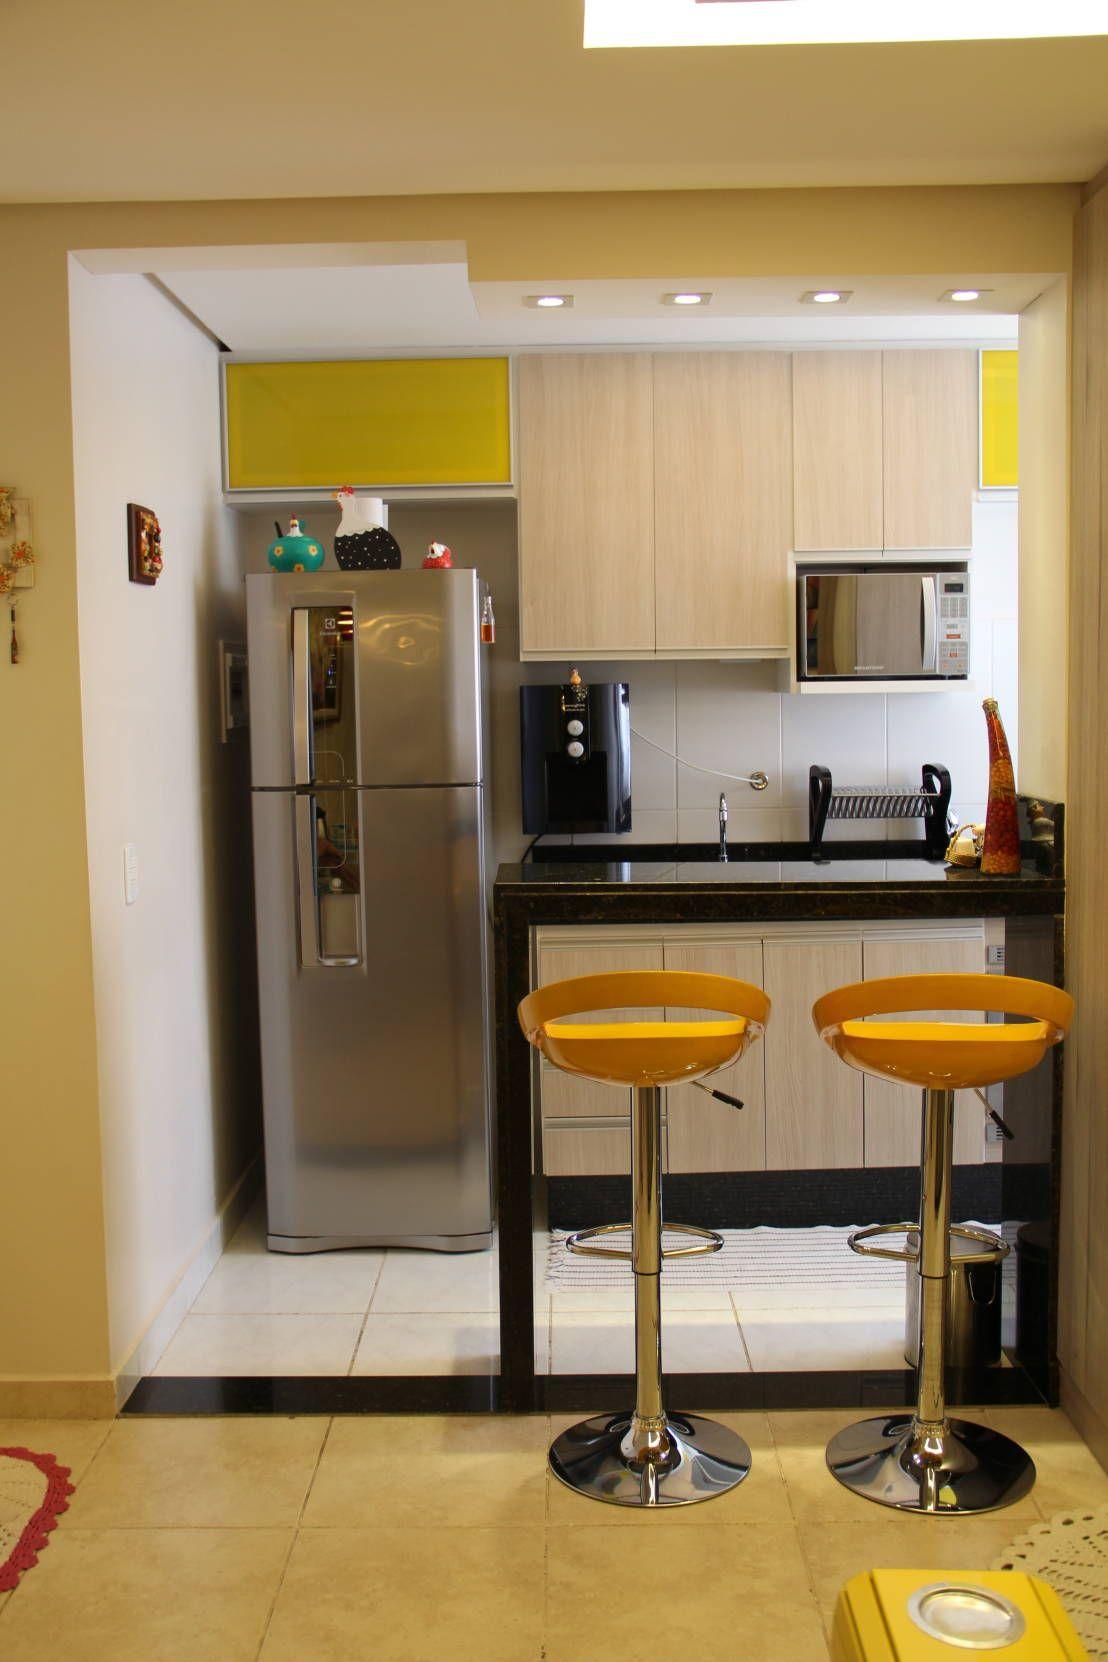 10 Barras De Cocina Fant Sticas Cocina Moderna Moderno Y Cocinas ~ Cocinas Pequeñas Para Apartamentos